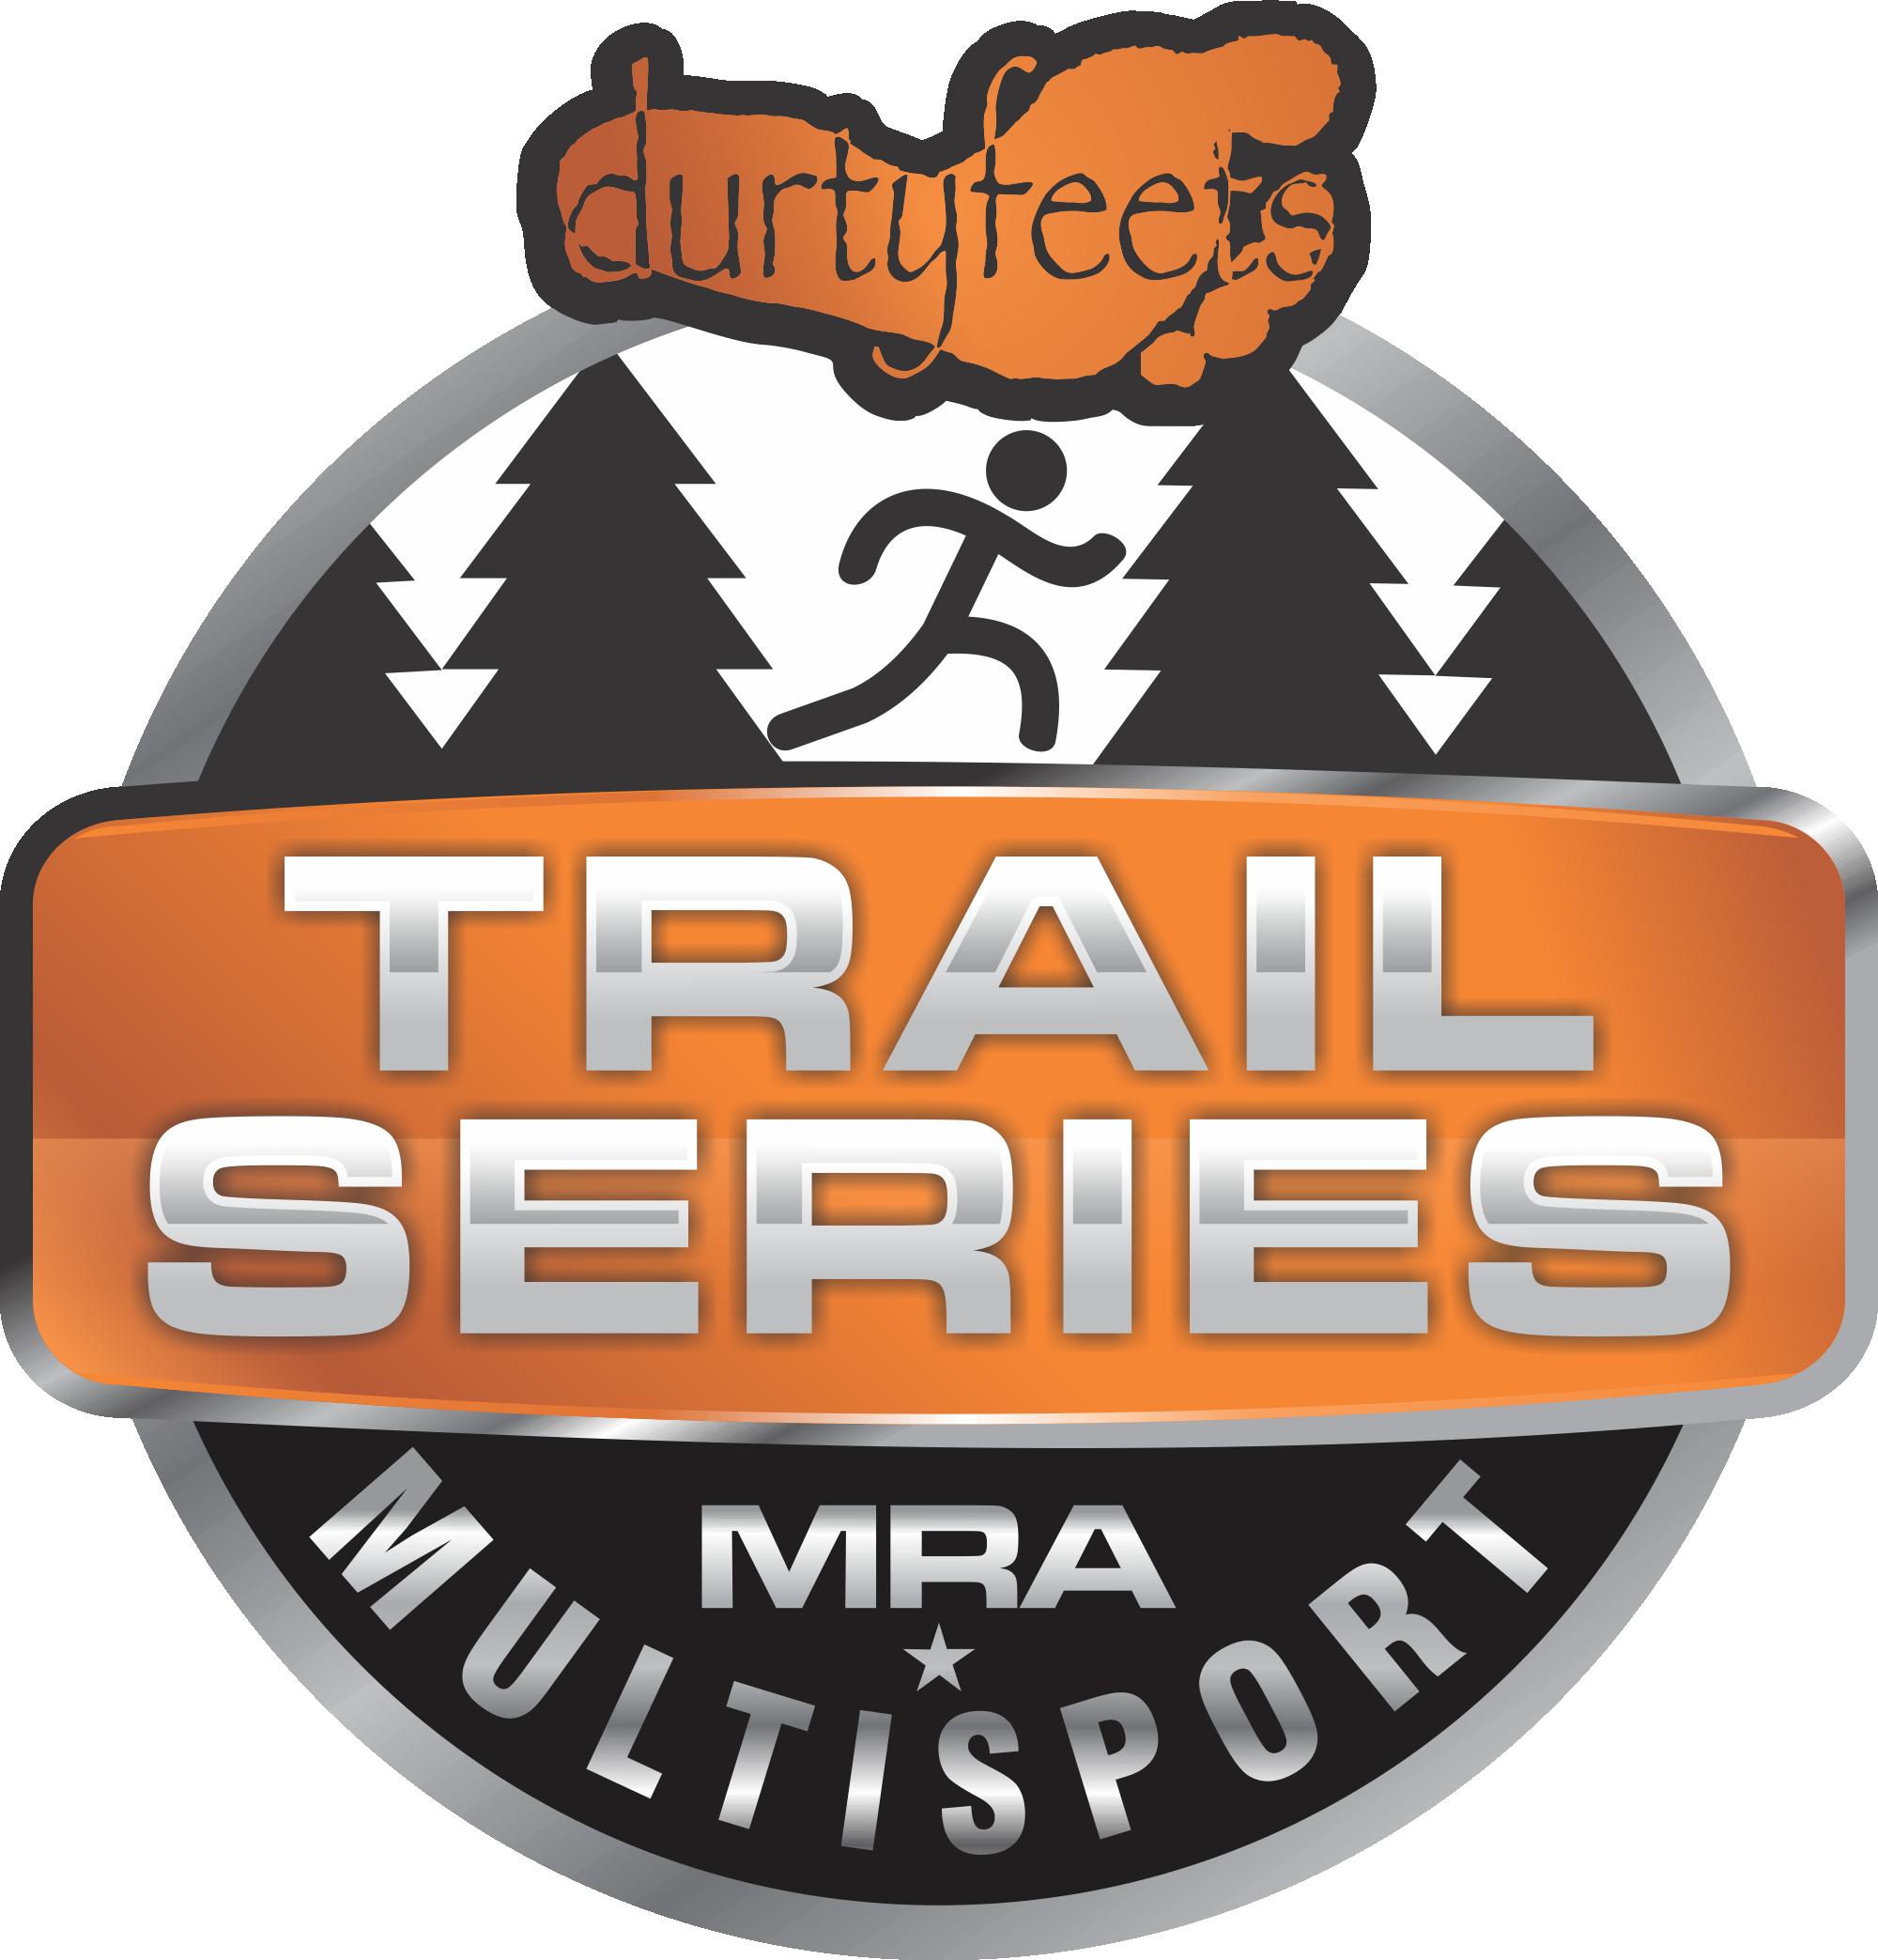 durtyfeets Trail Series